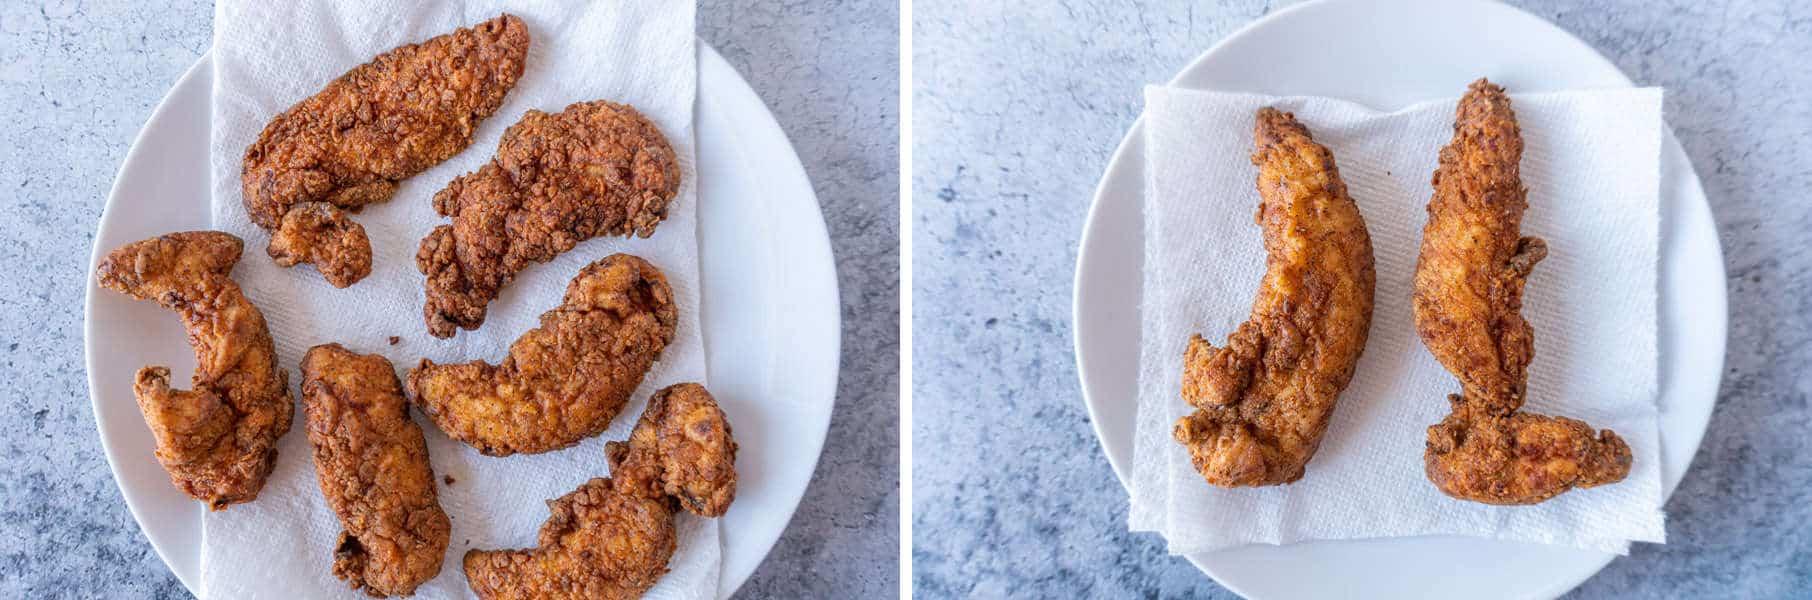 Crispy Chicken Tenders strained vs un-strained fried chicken